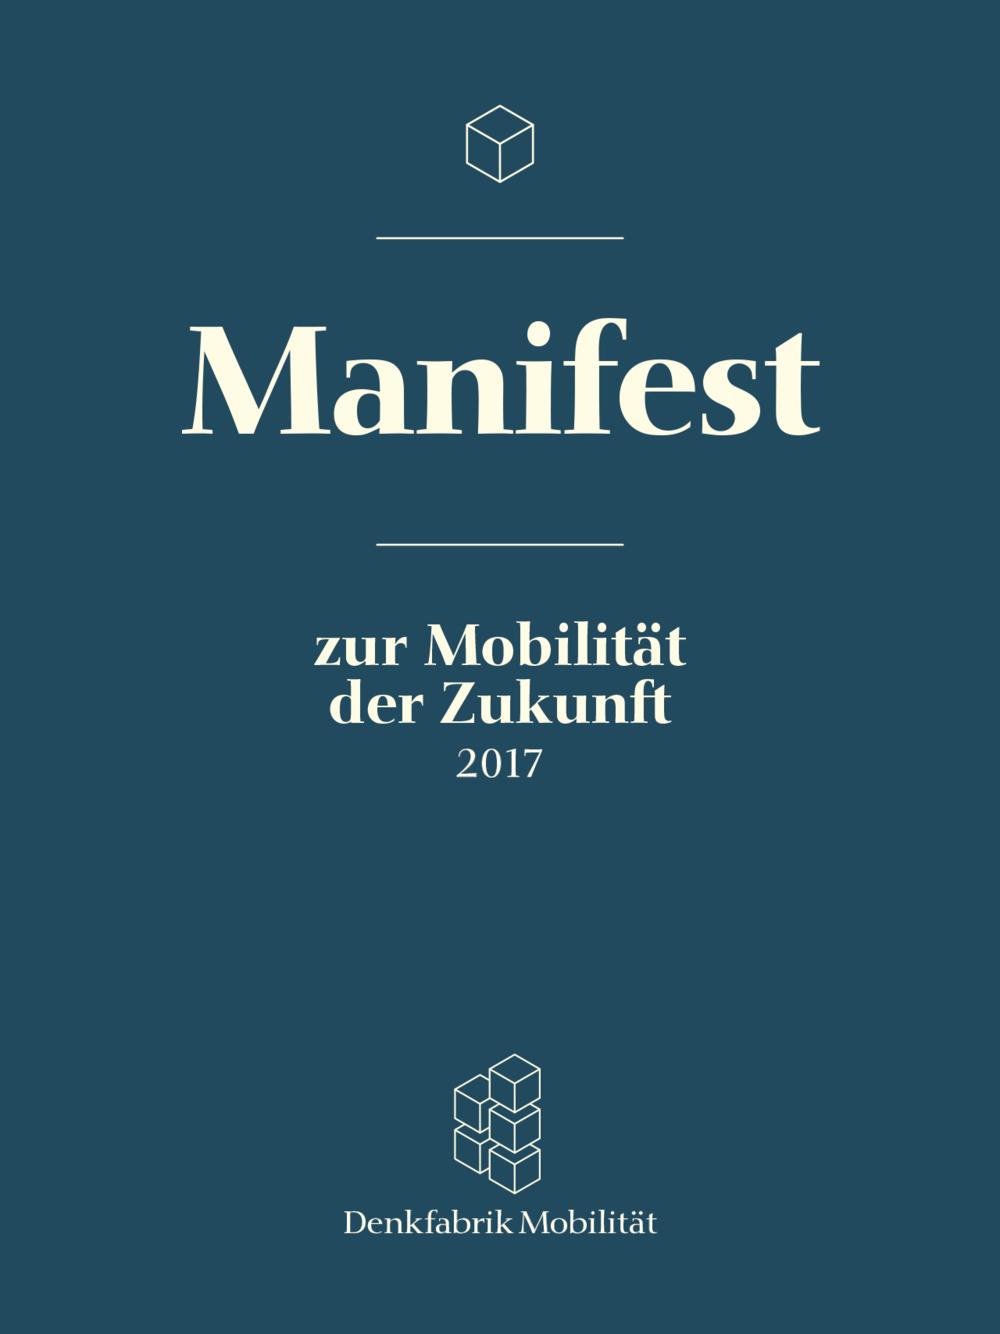 RZ_DFM_Manifest_2017_105x140-1.png